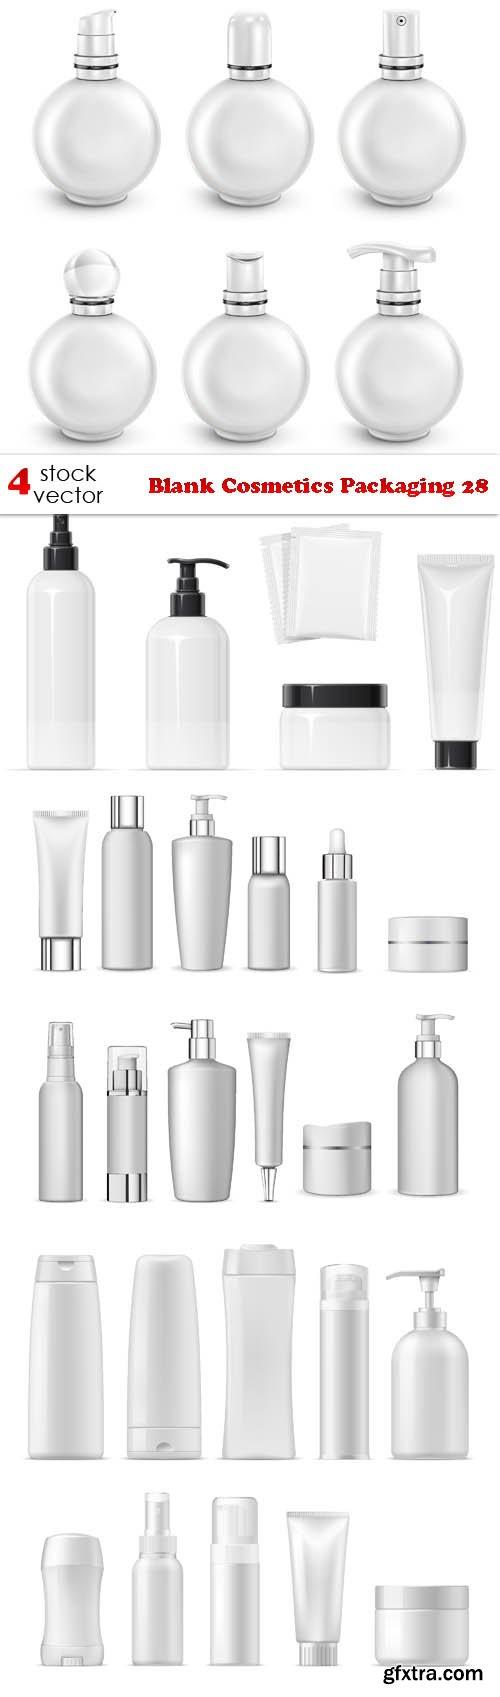 Vectors - Blank Cosmetics Packaging 28